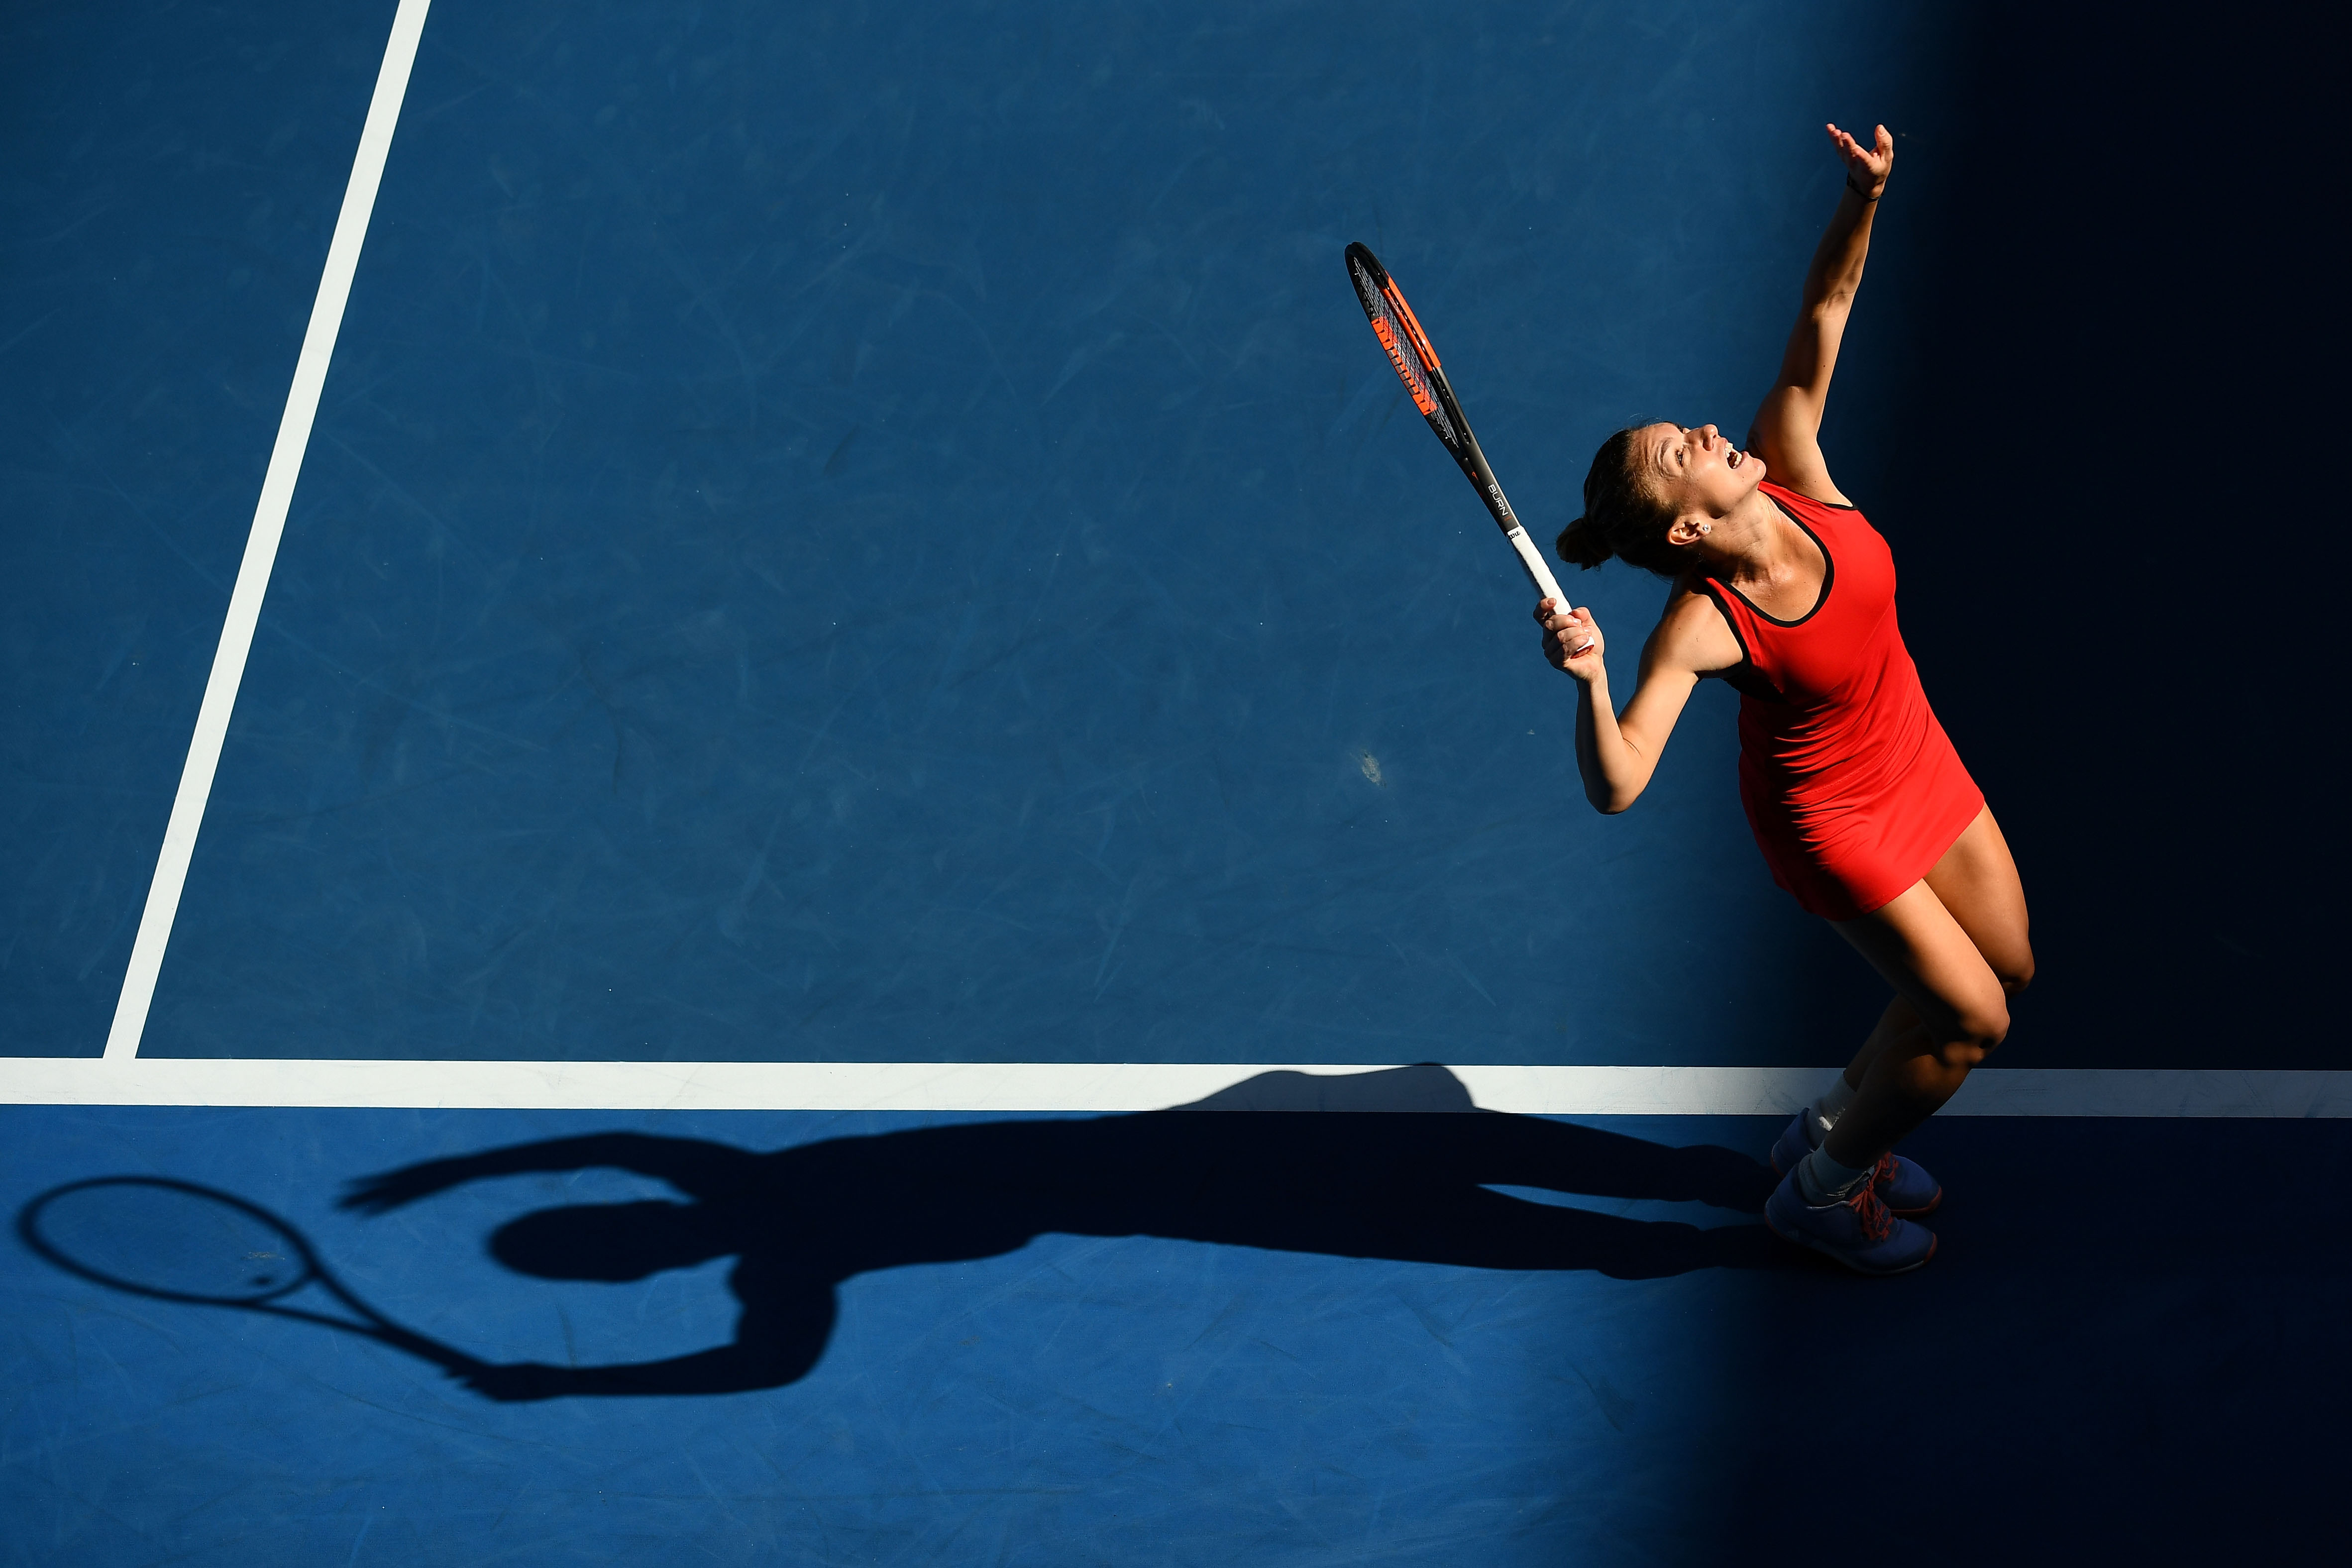 Dominant Wozniacki races into Saint Petersburg quarter-finals